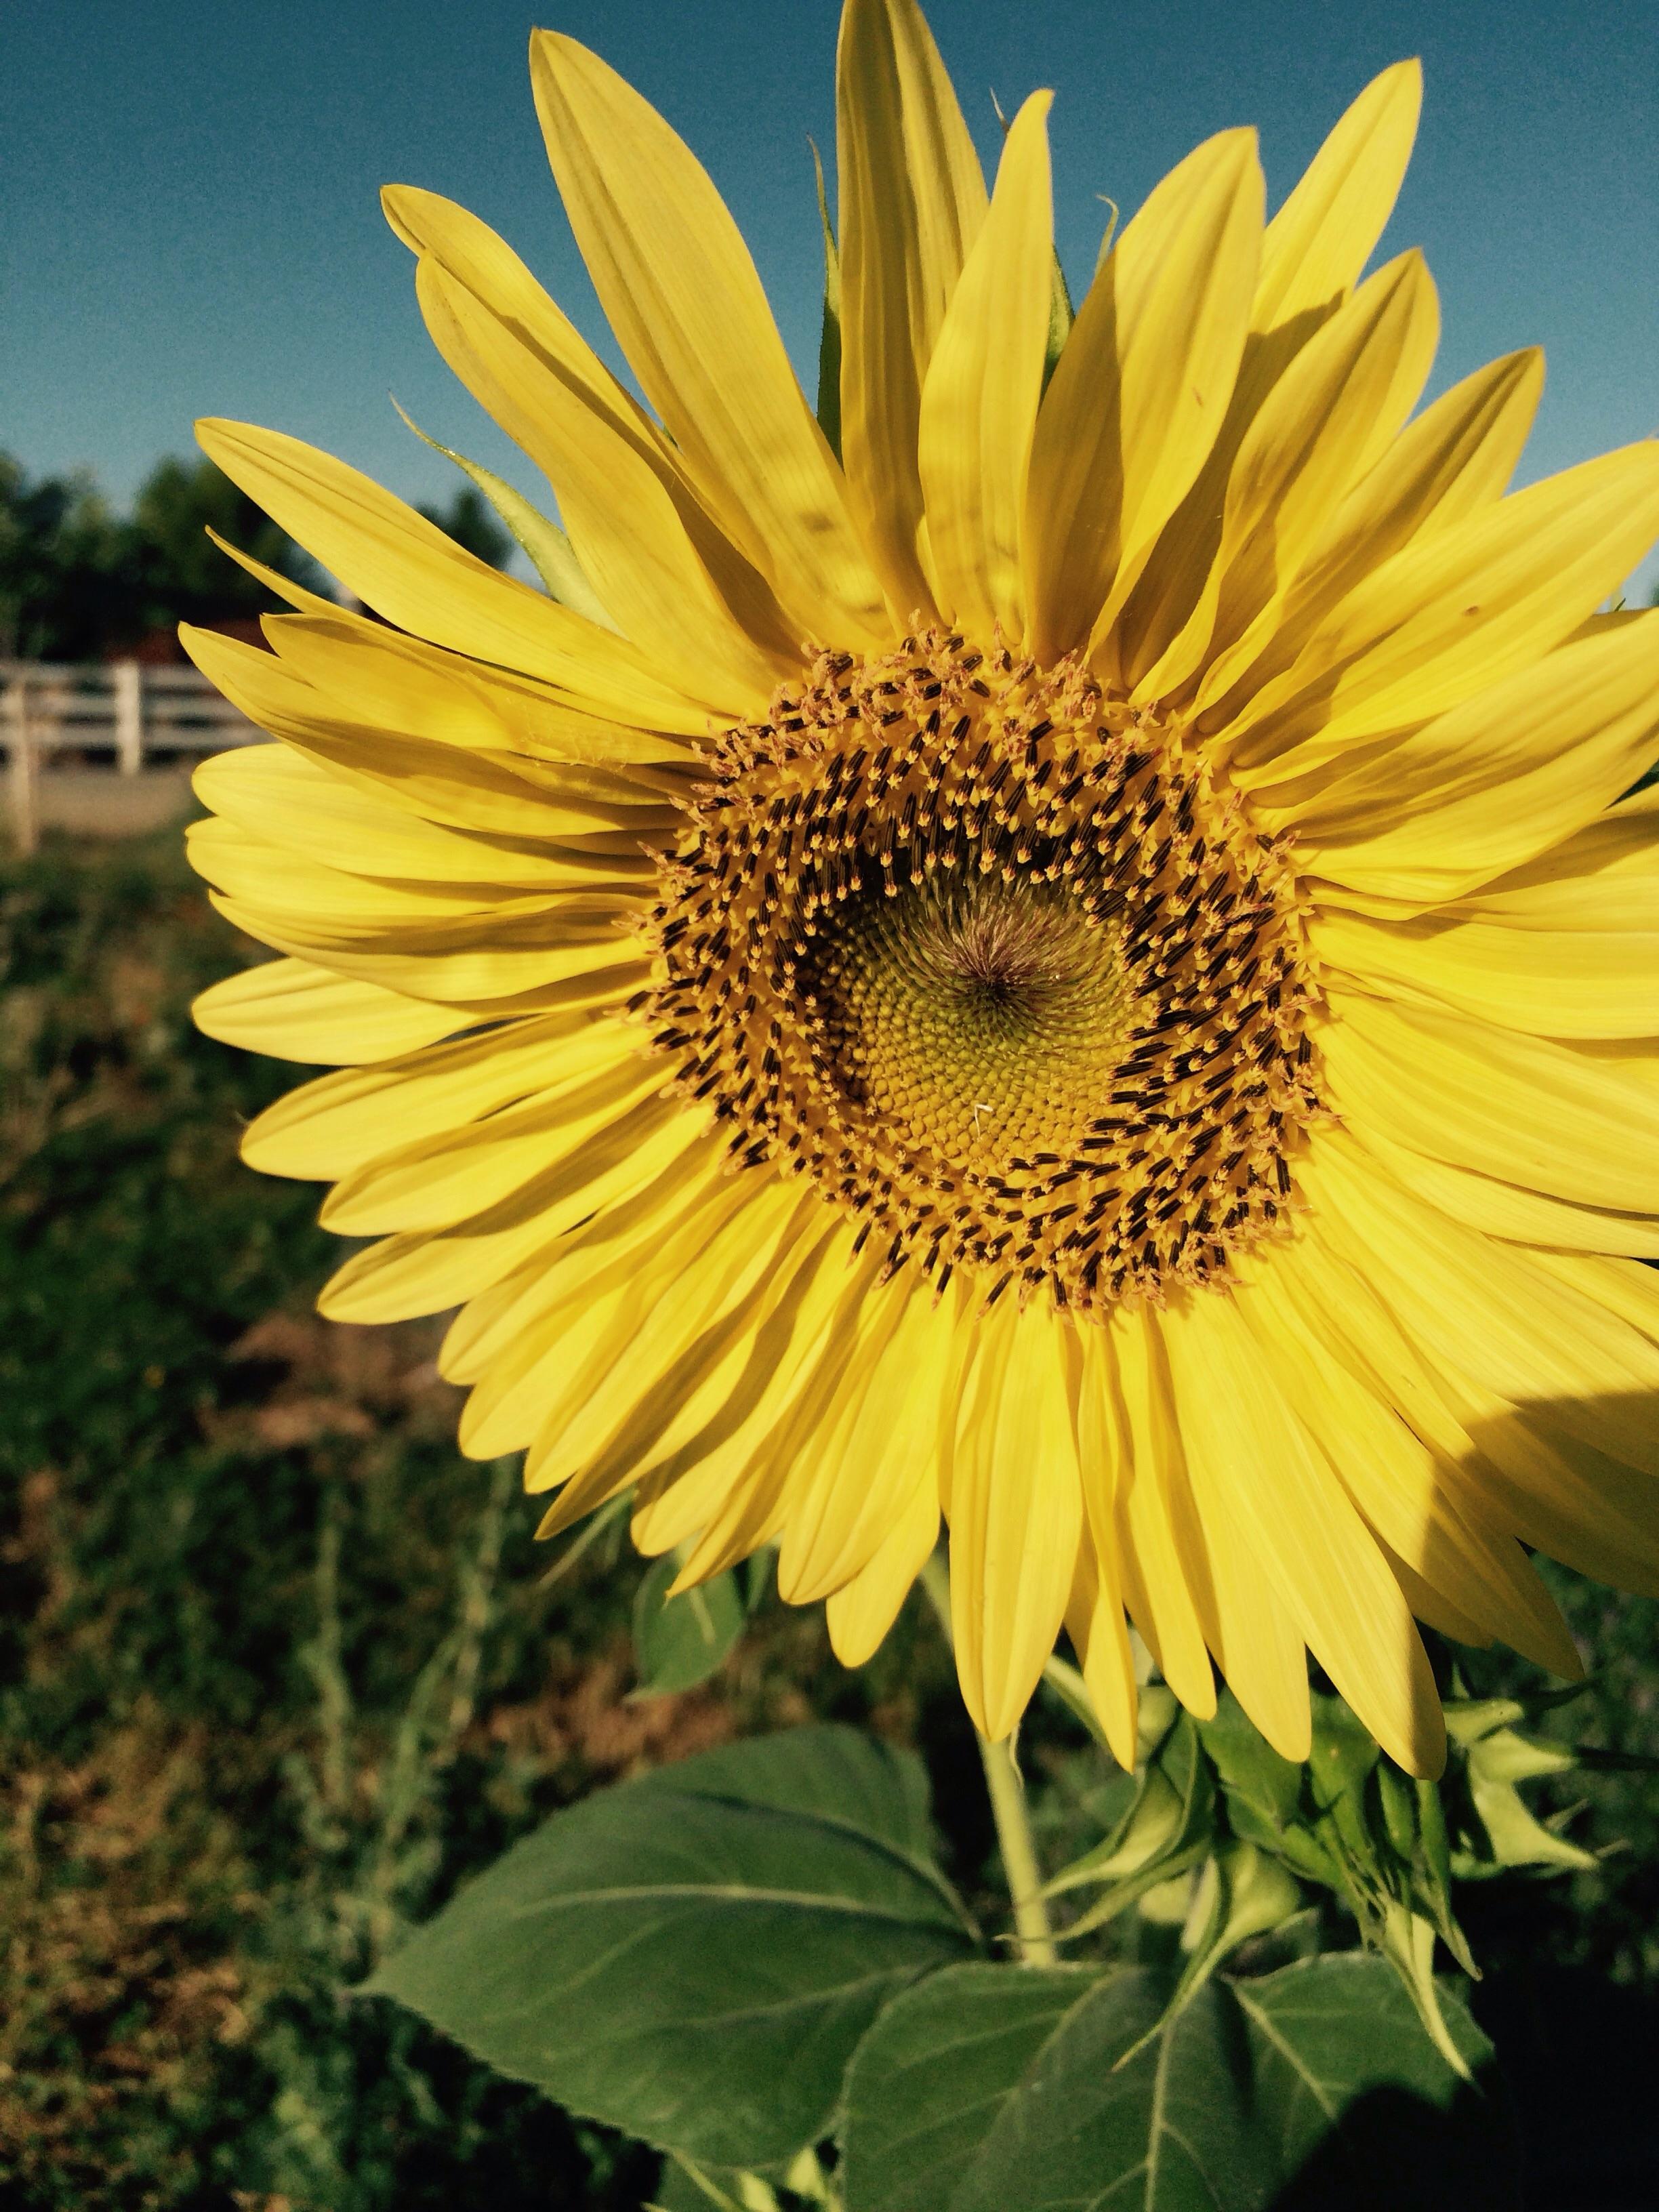 We woke up to this bright sunflower saying hello to the sunshine